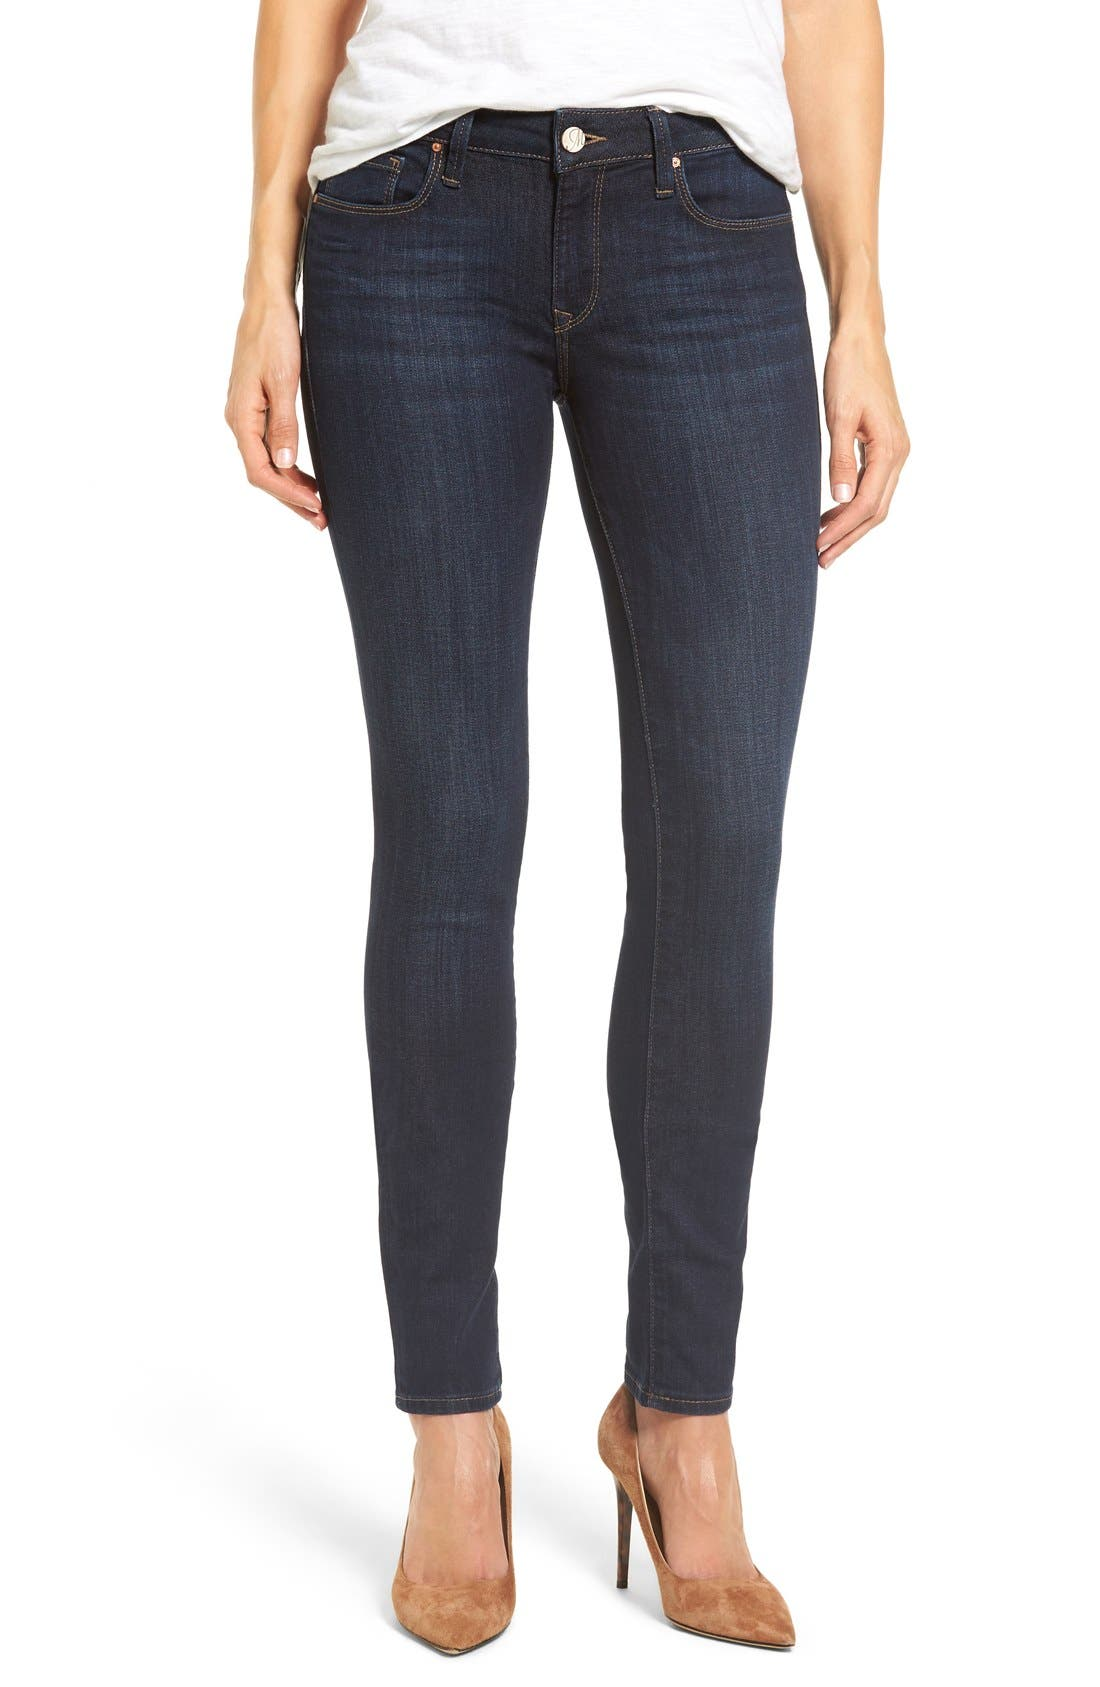 MAVI JEANS Alexa Stretch Skinny Jeans